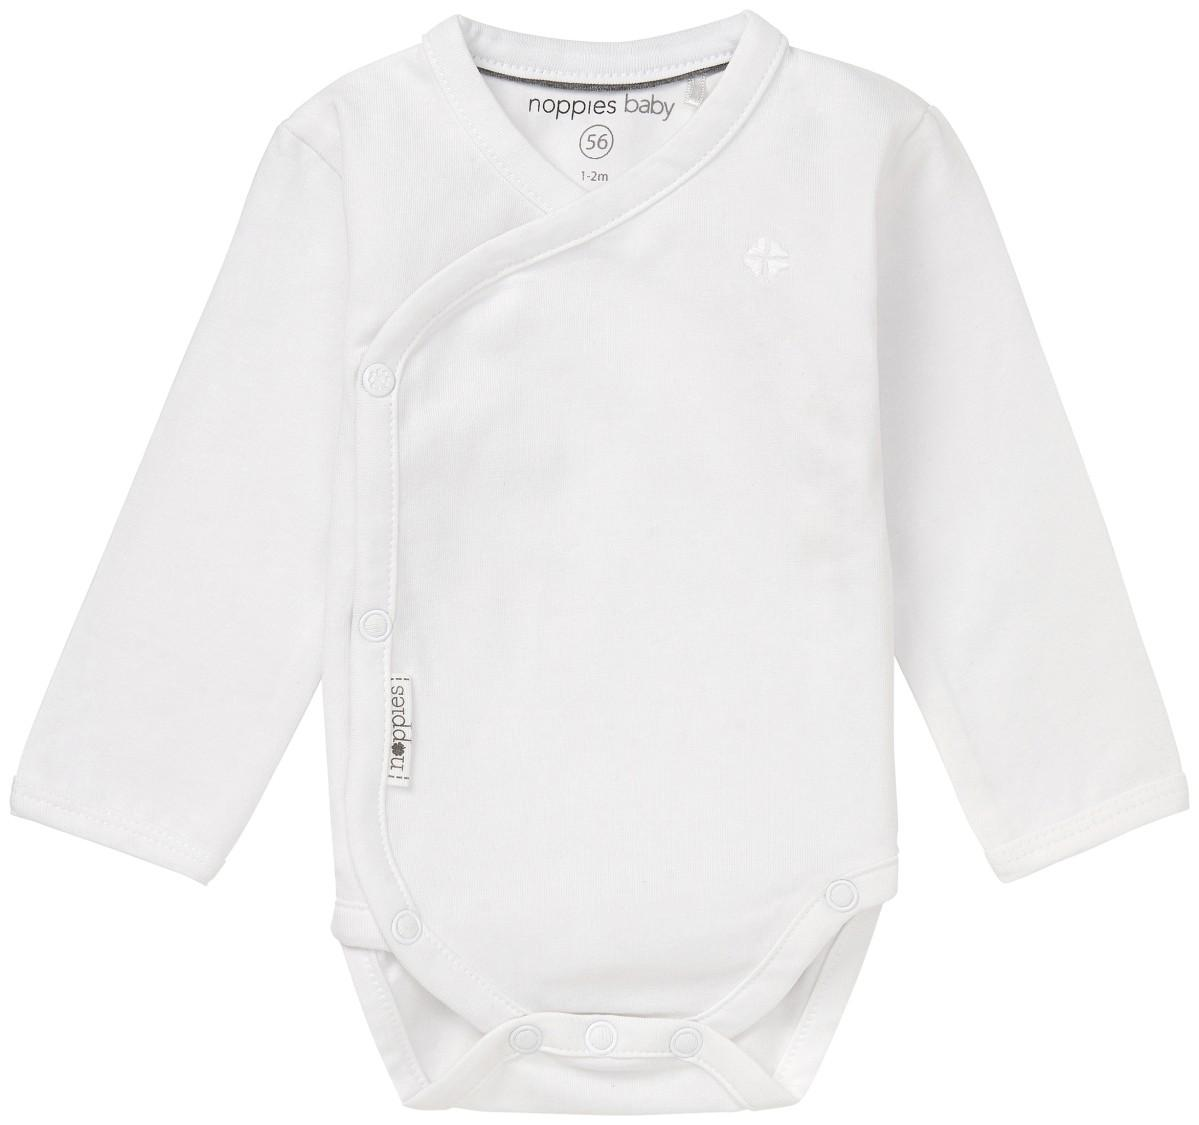 Noppies - Babypakje Ziara White - 9M